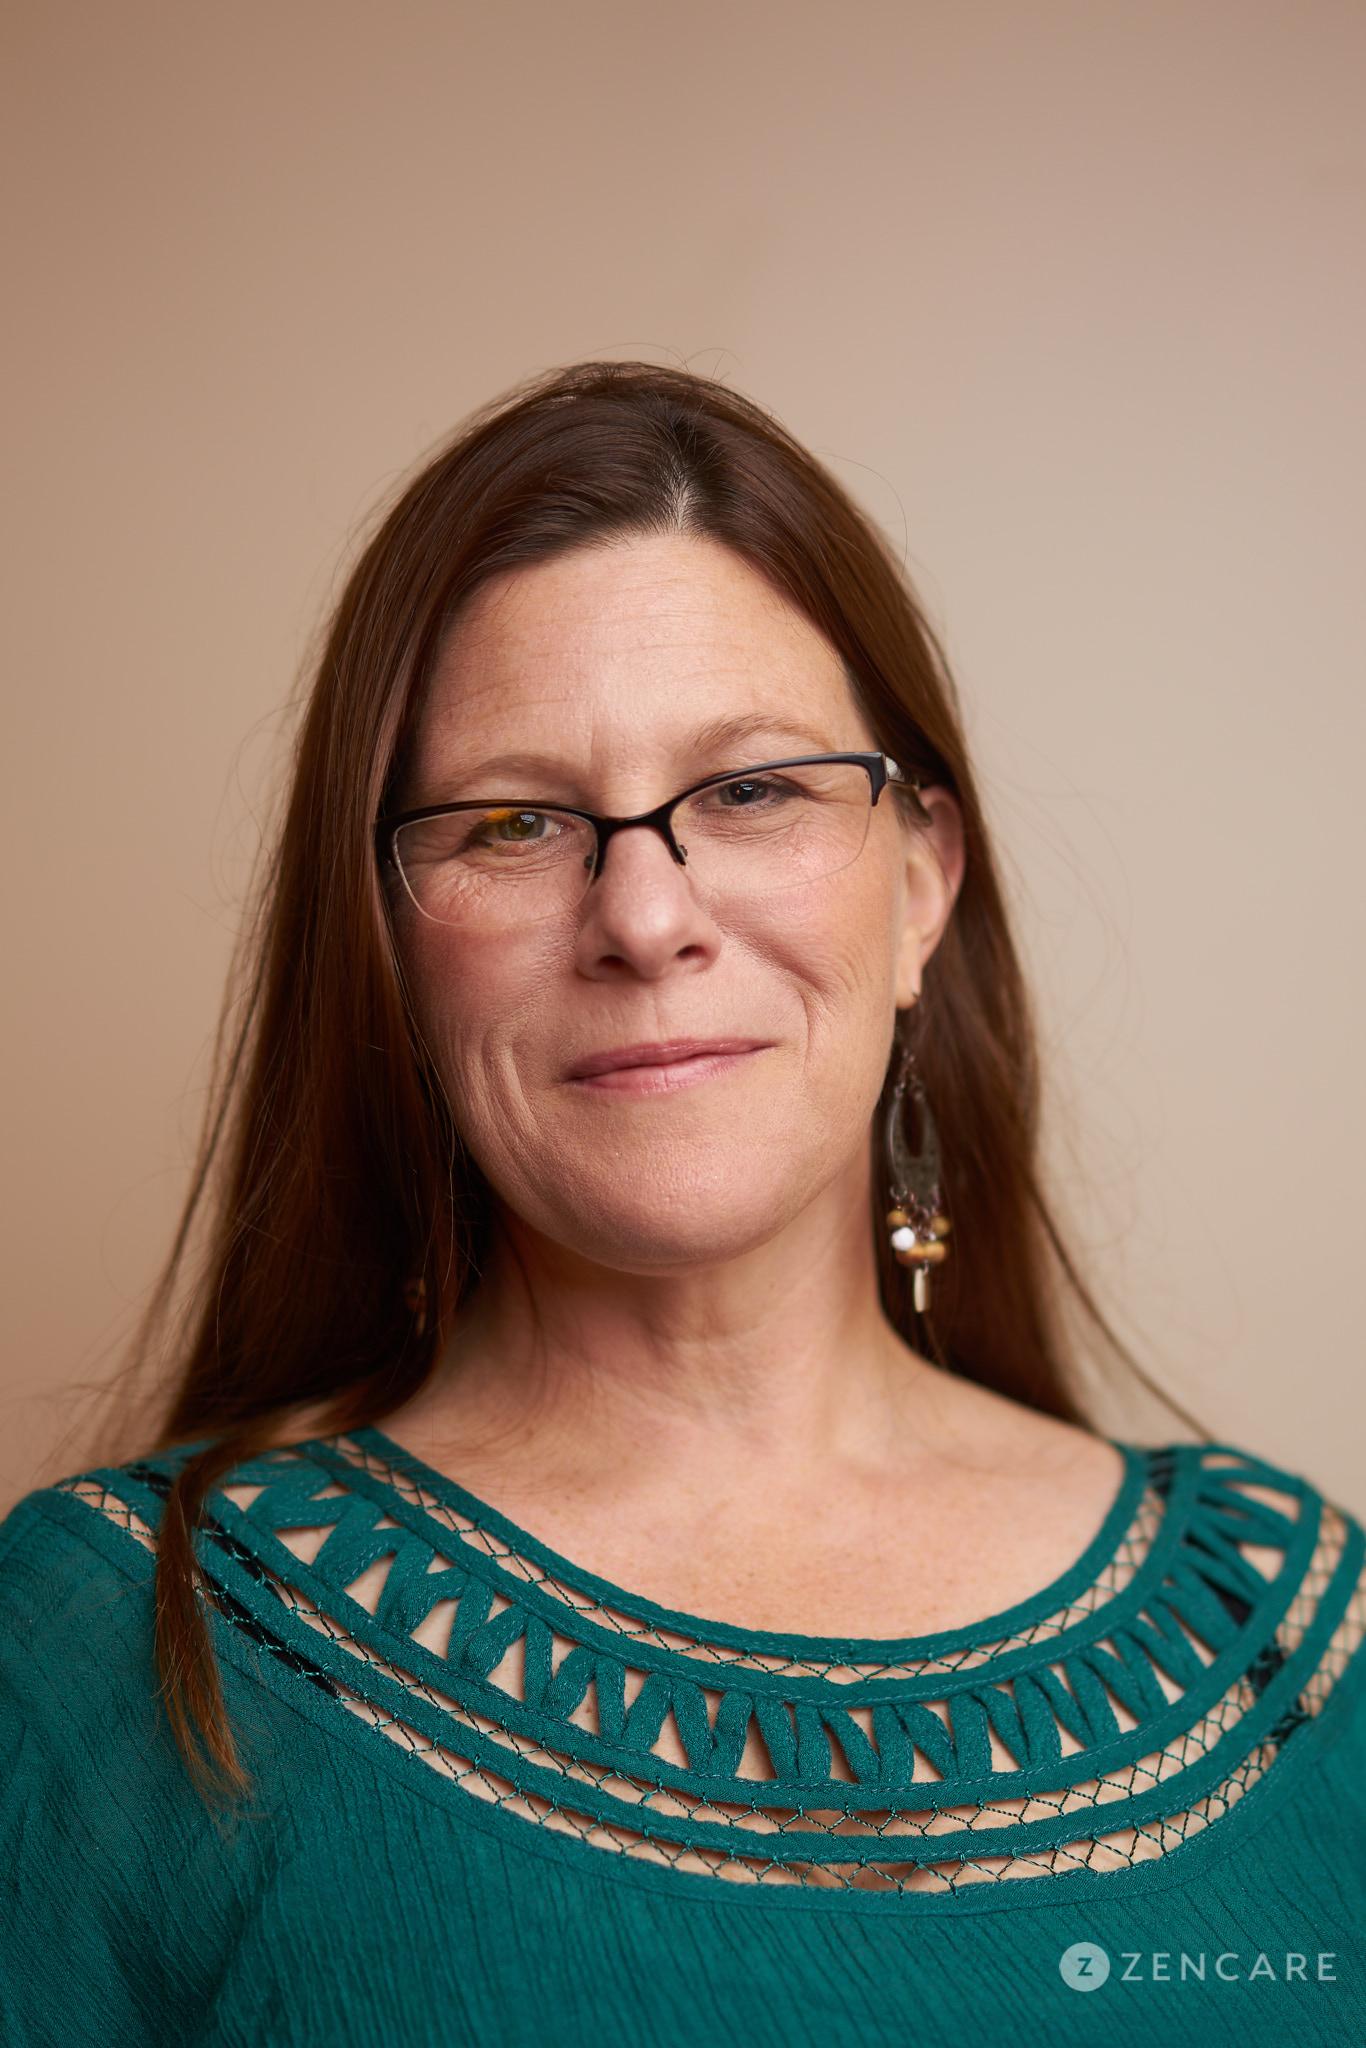 Sarah Knight, LMHC - Counselor in North Kingstown RI -5.jpg